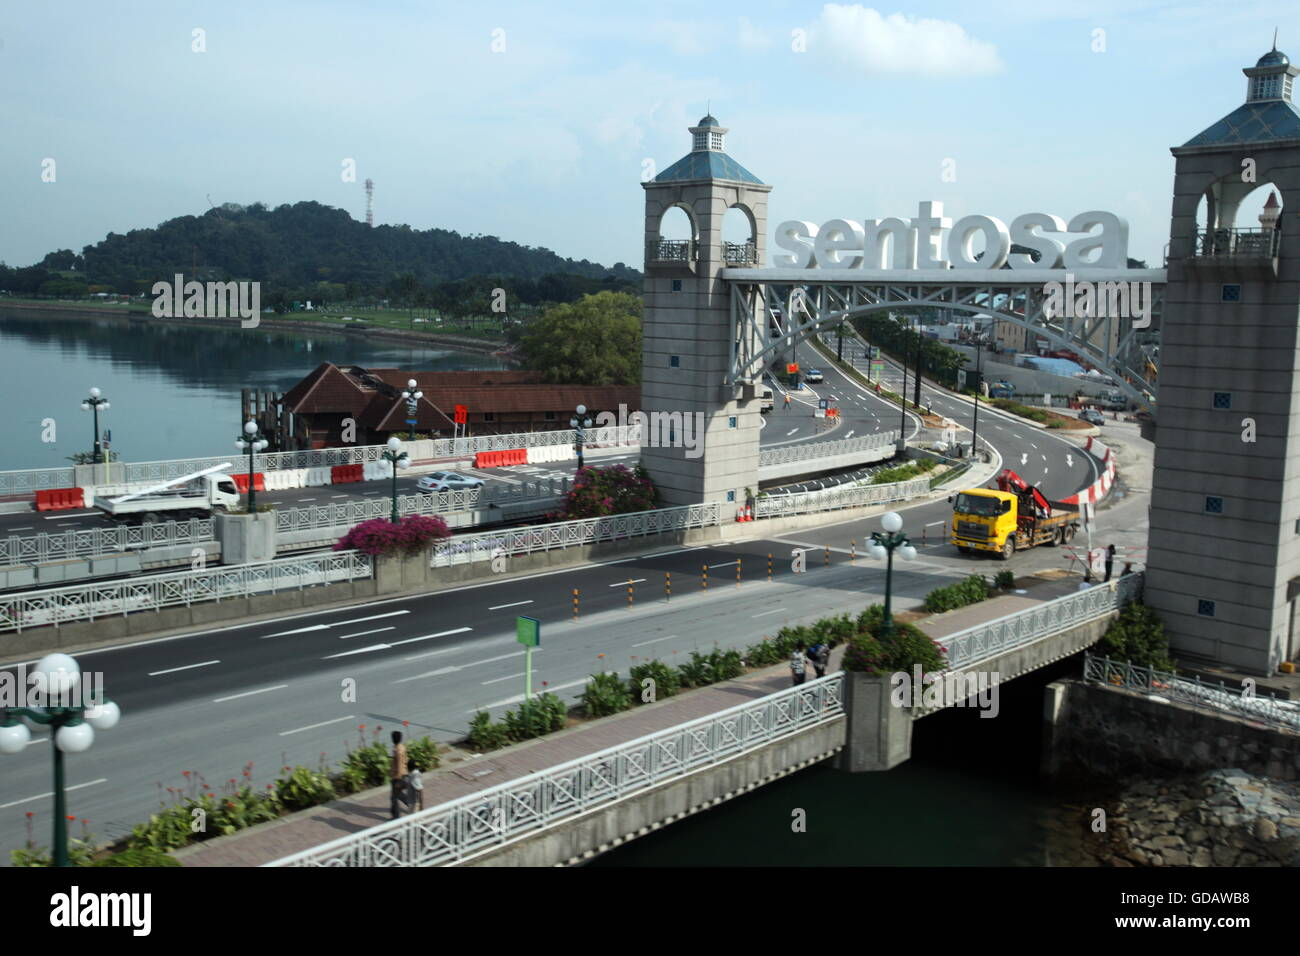 Asien, Suedost, Singapur, Insel, Staat, Stadt, City, Sentosa Island, Bruecke, Strasse, Autobahn, Stock Photo